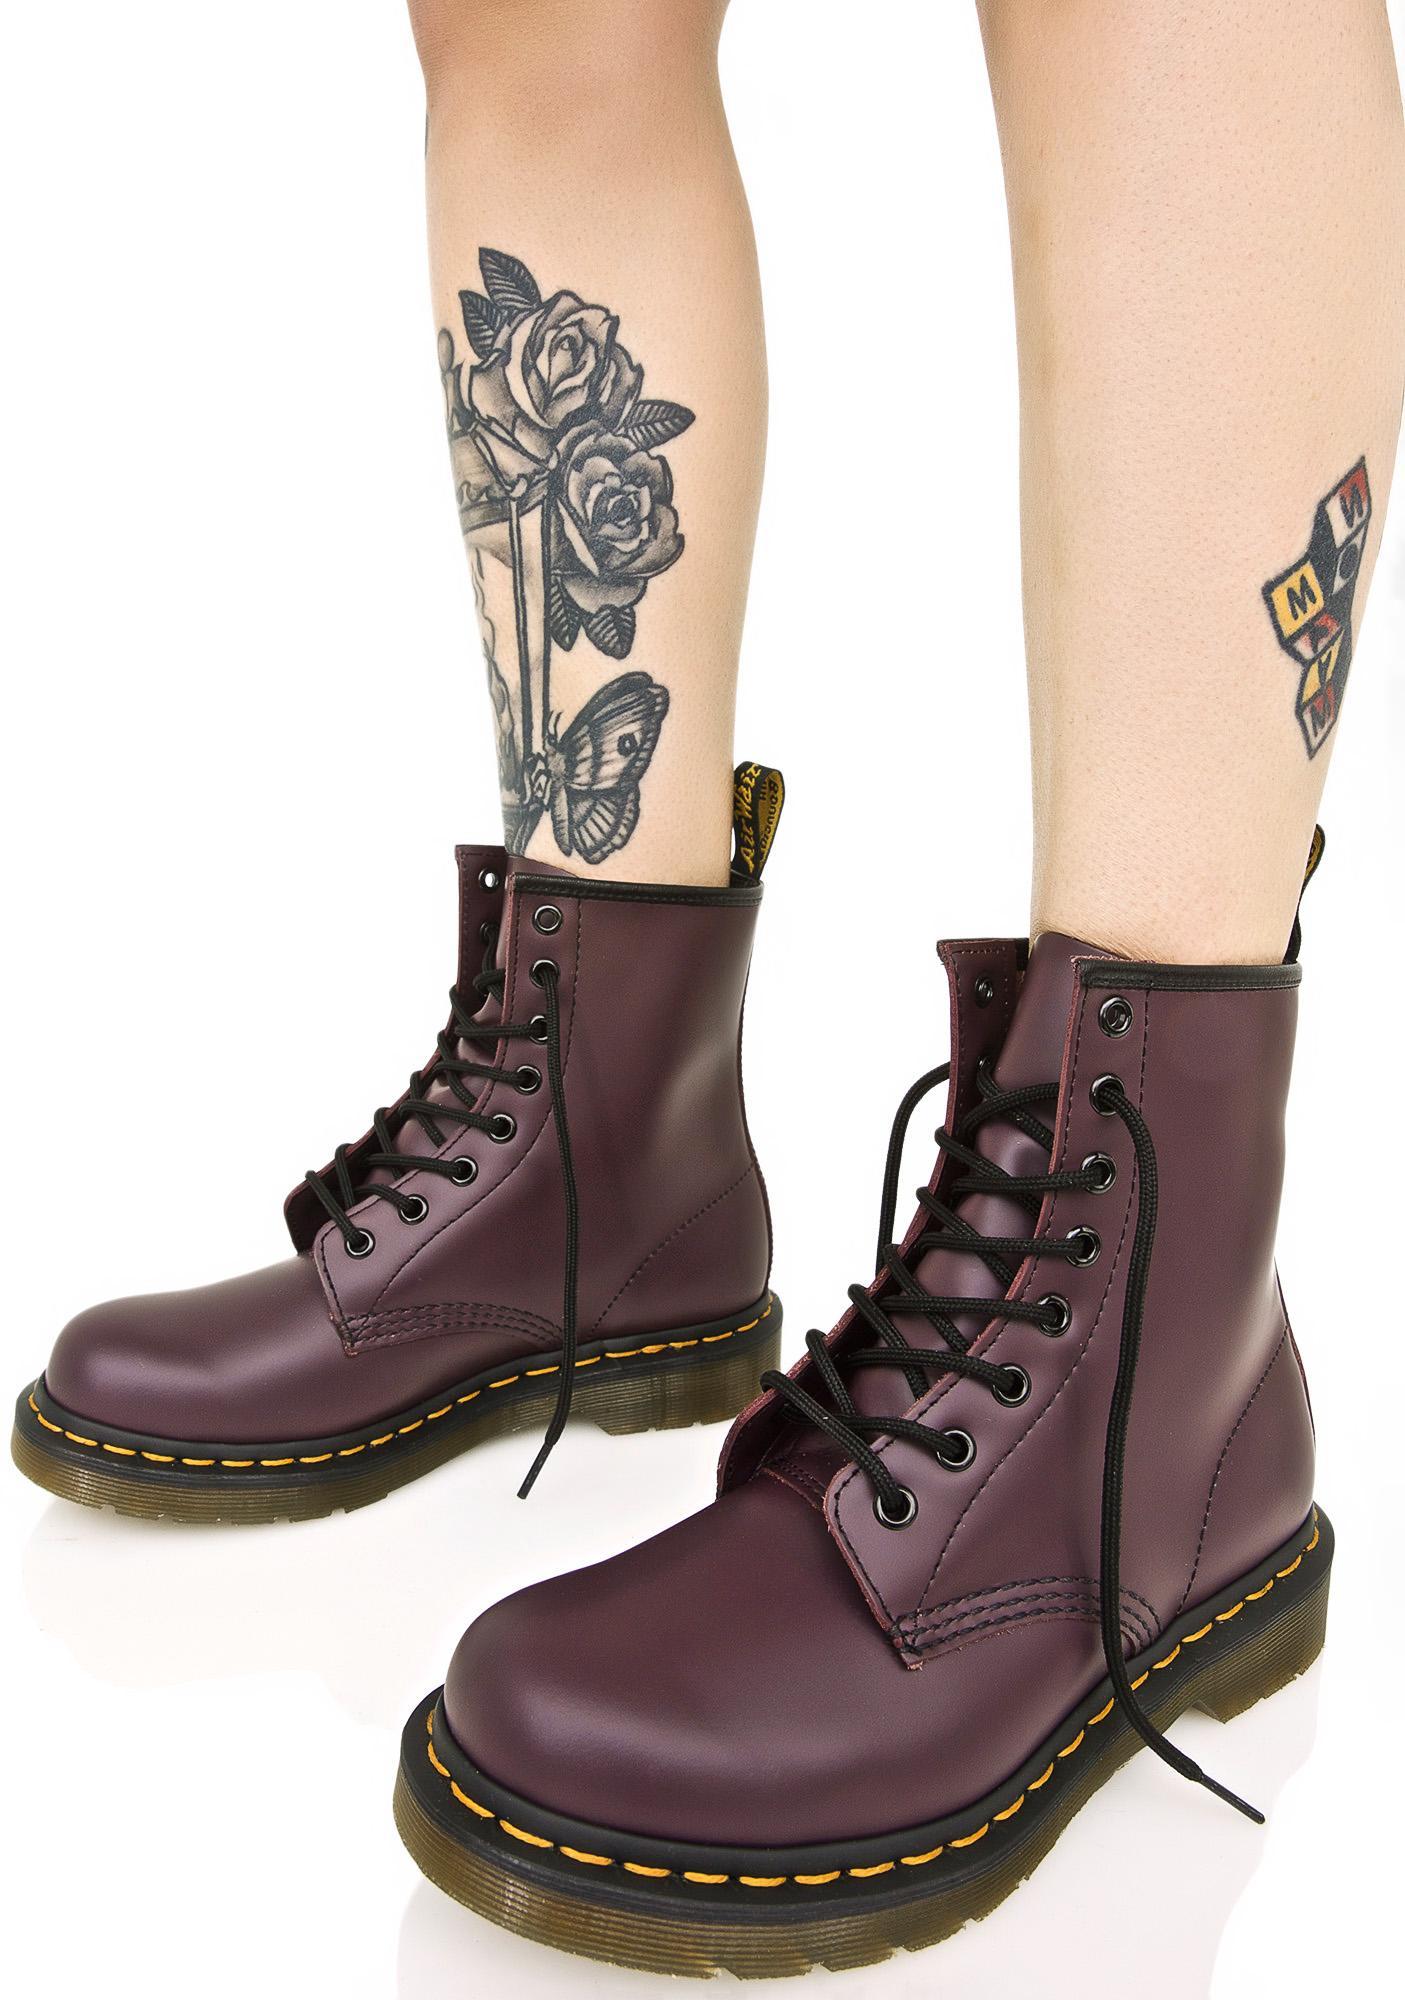 4a843bb42d Dr. Martens Royal Purple 1460 8 Eye Boots | Dolls Kill